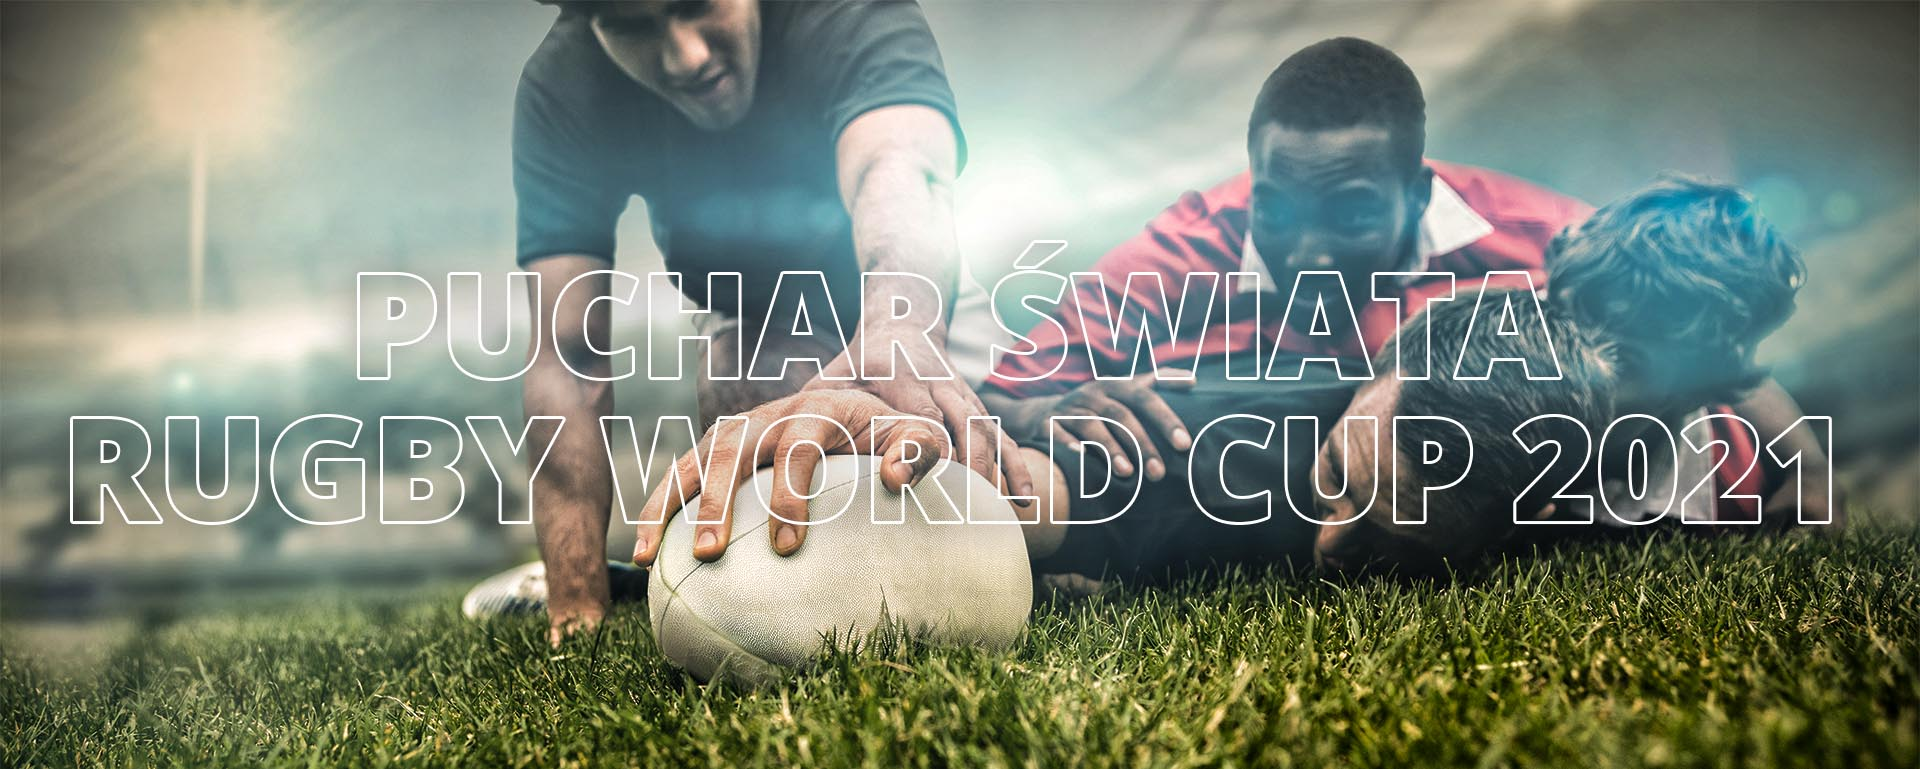 Puchar Świata – Rugby World Cup 2021